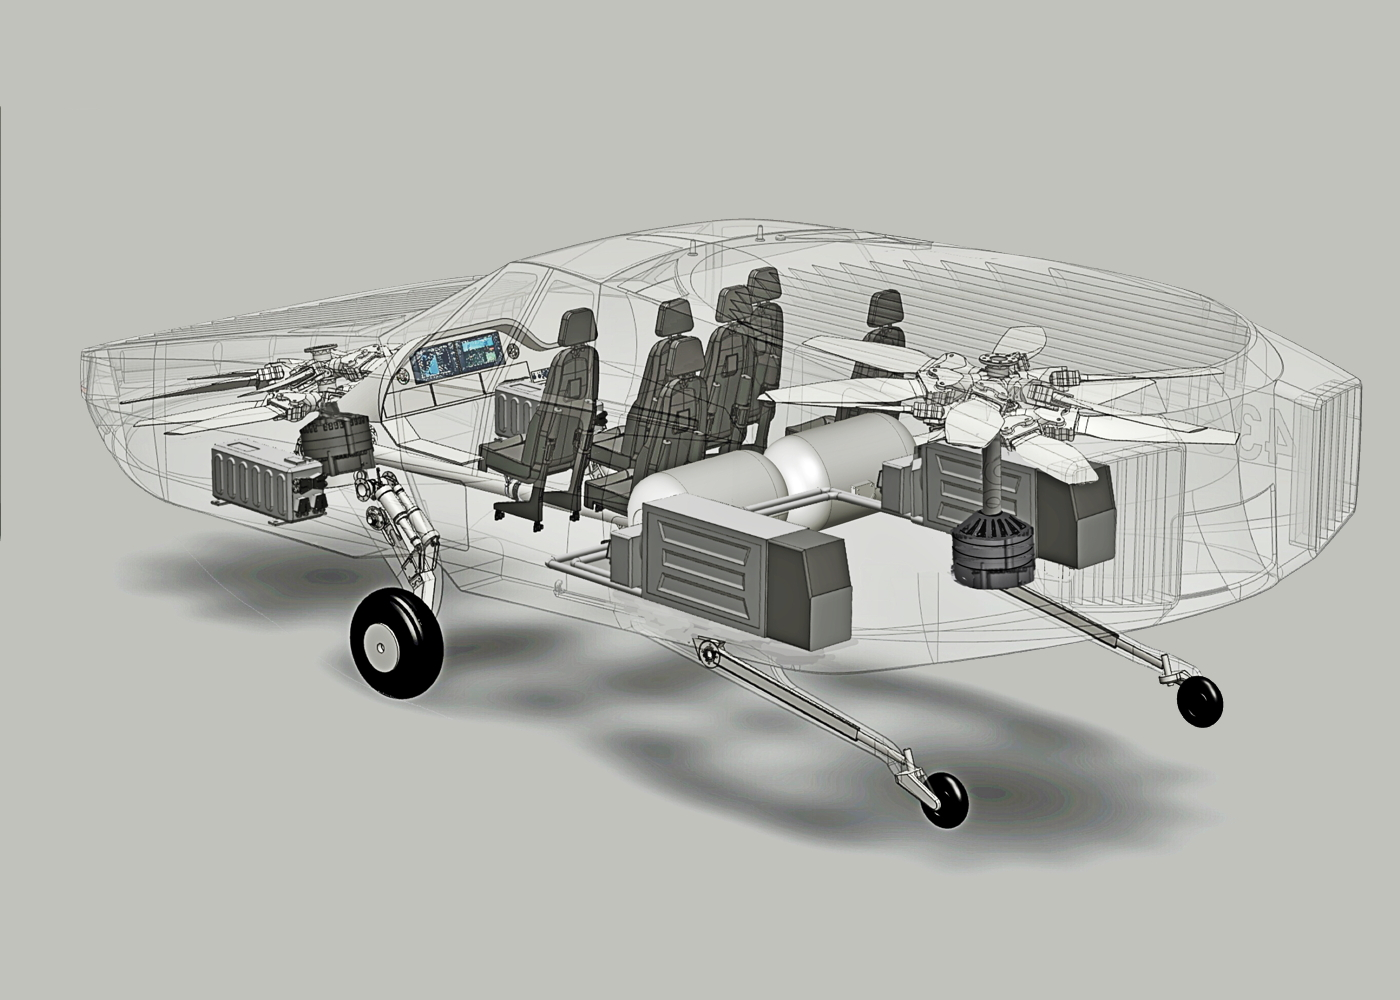 Urban Aeronautics CityHawk eVTOL